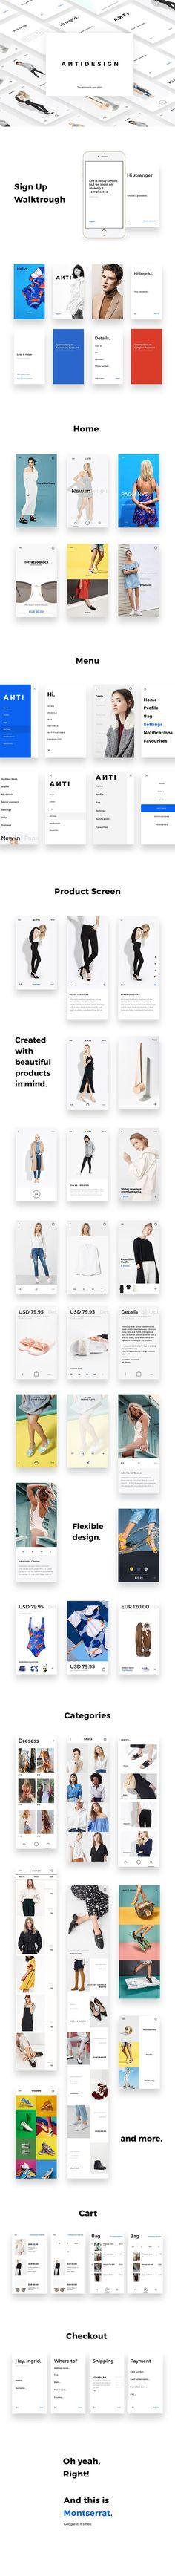 ANTIDESIGN - The Minimalist e-commerce UI Kit on Behance: